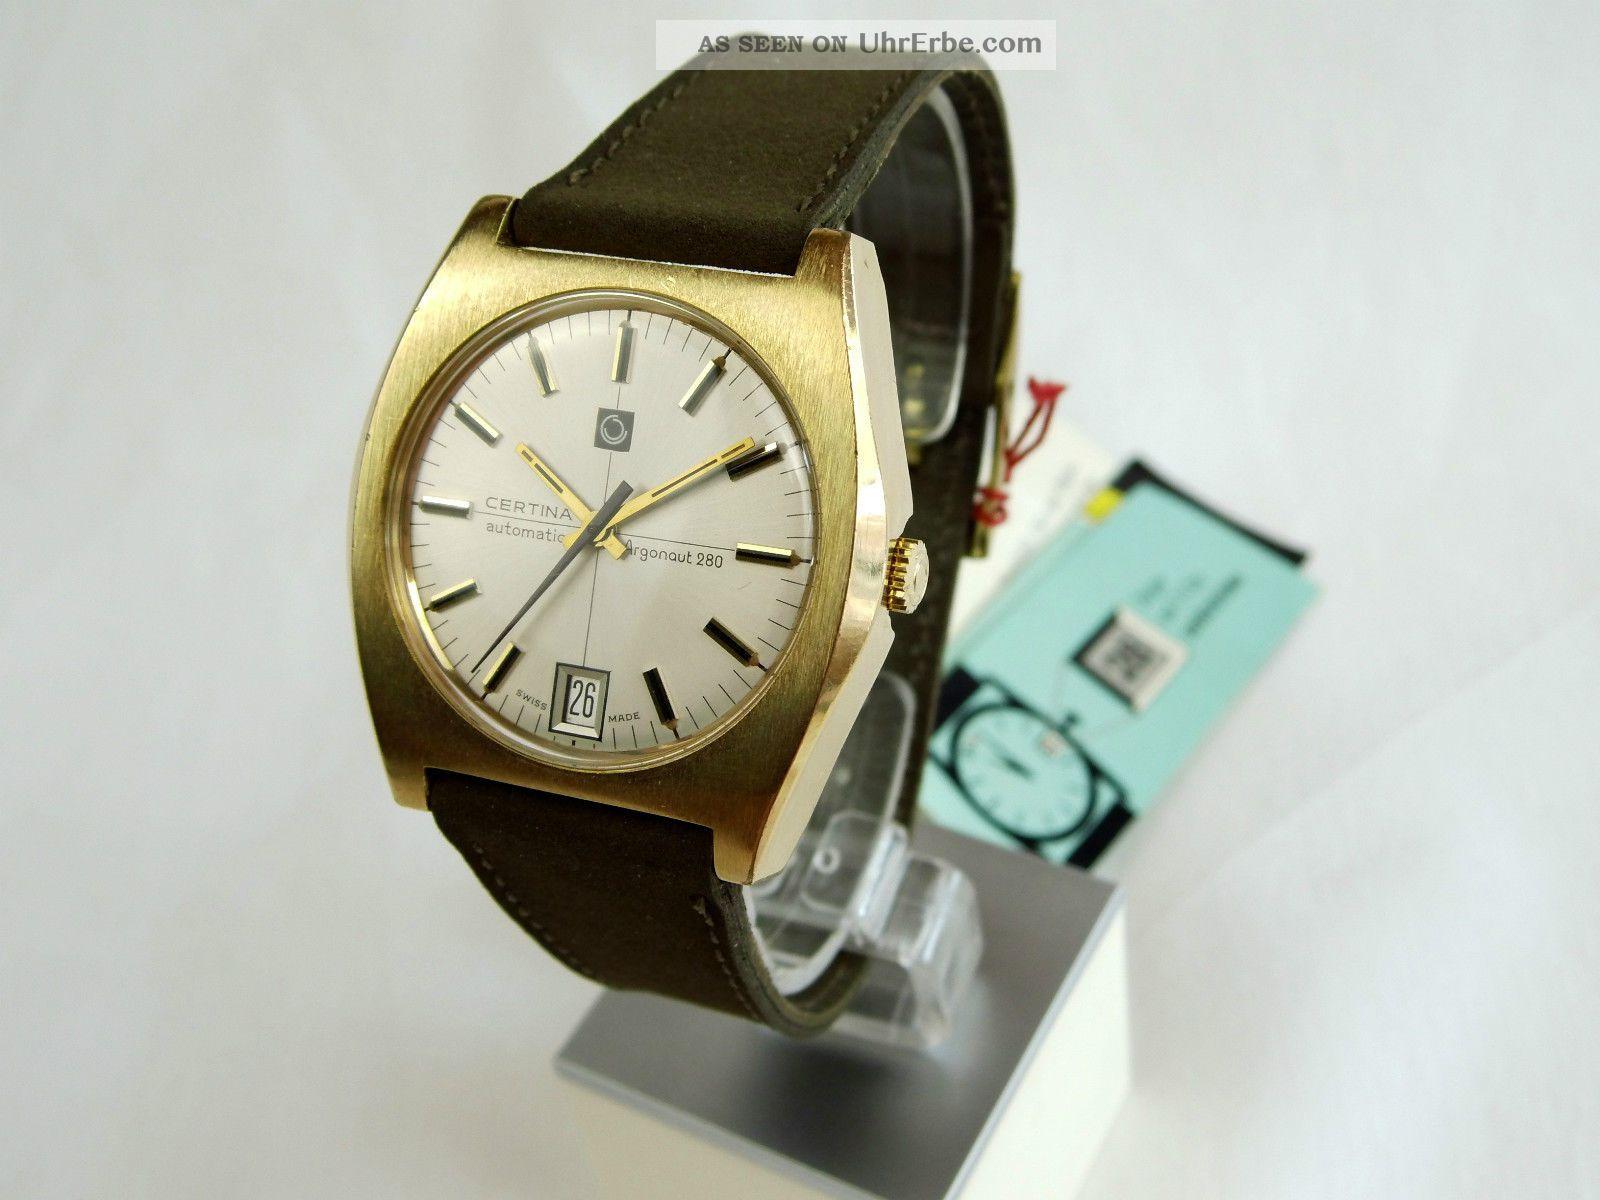 Certina Argonaut 280 Automatic Armbanduhr Datum Gold Doublee Old Stock Armbanduhren Bild